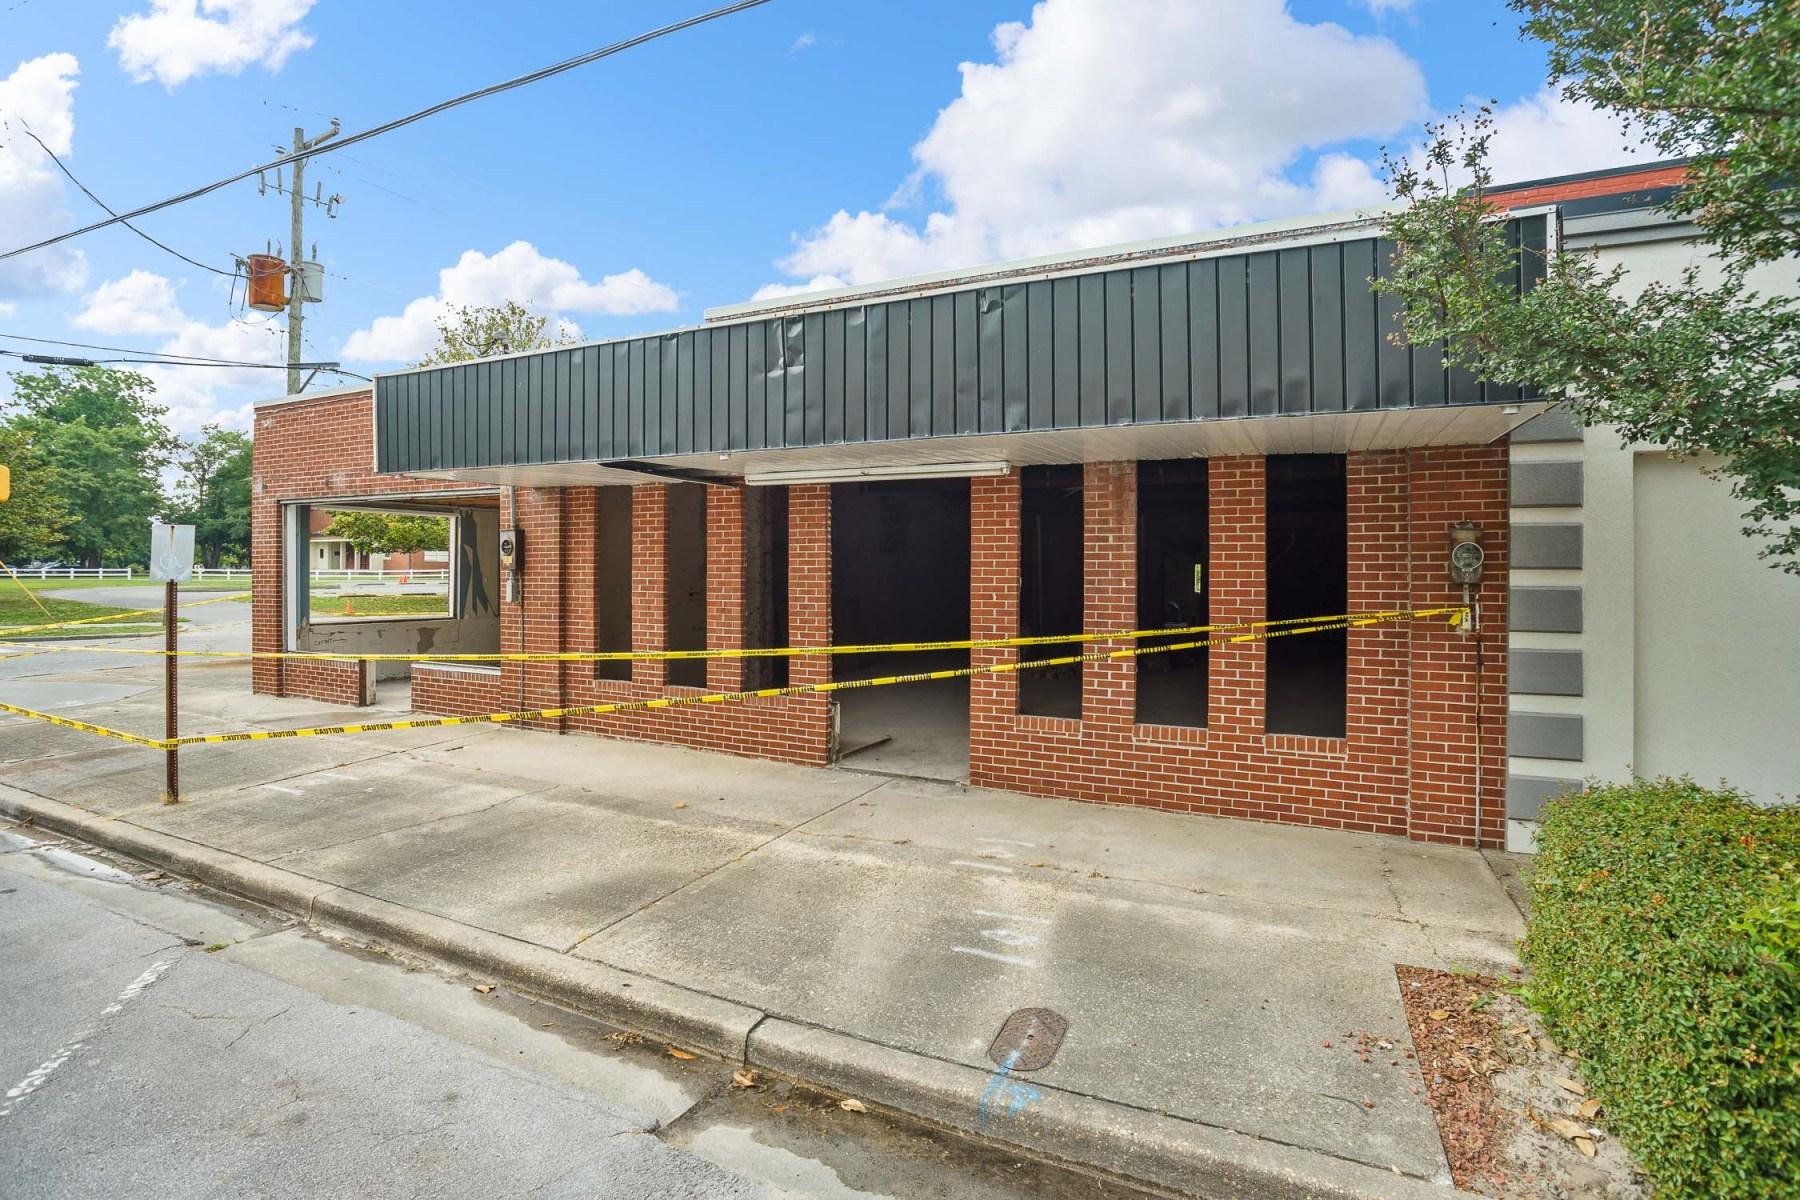 Horizons-East-Office-Renovation-1st-Set-27May2021_SB_01303_web-size